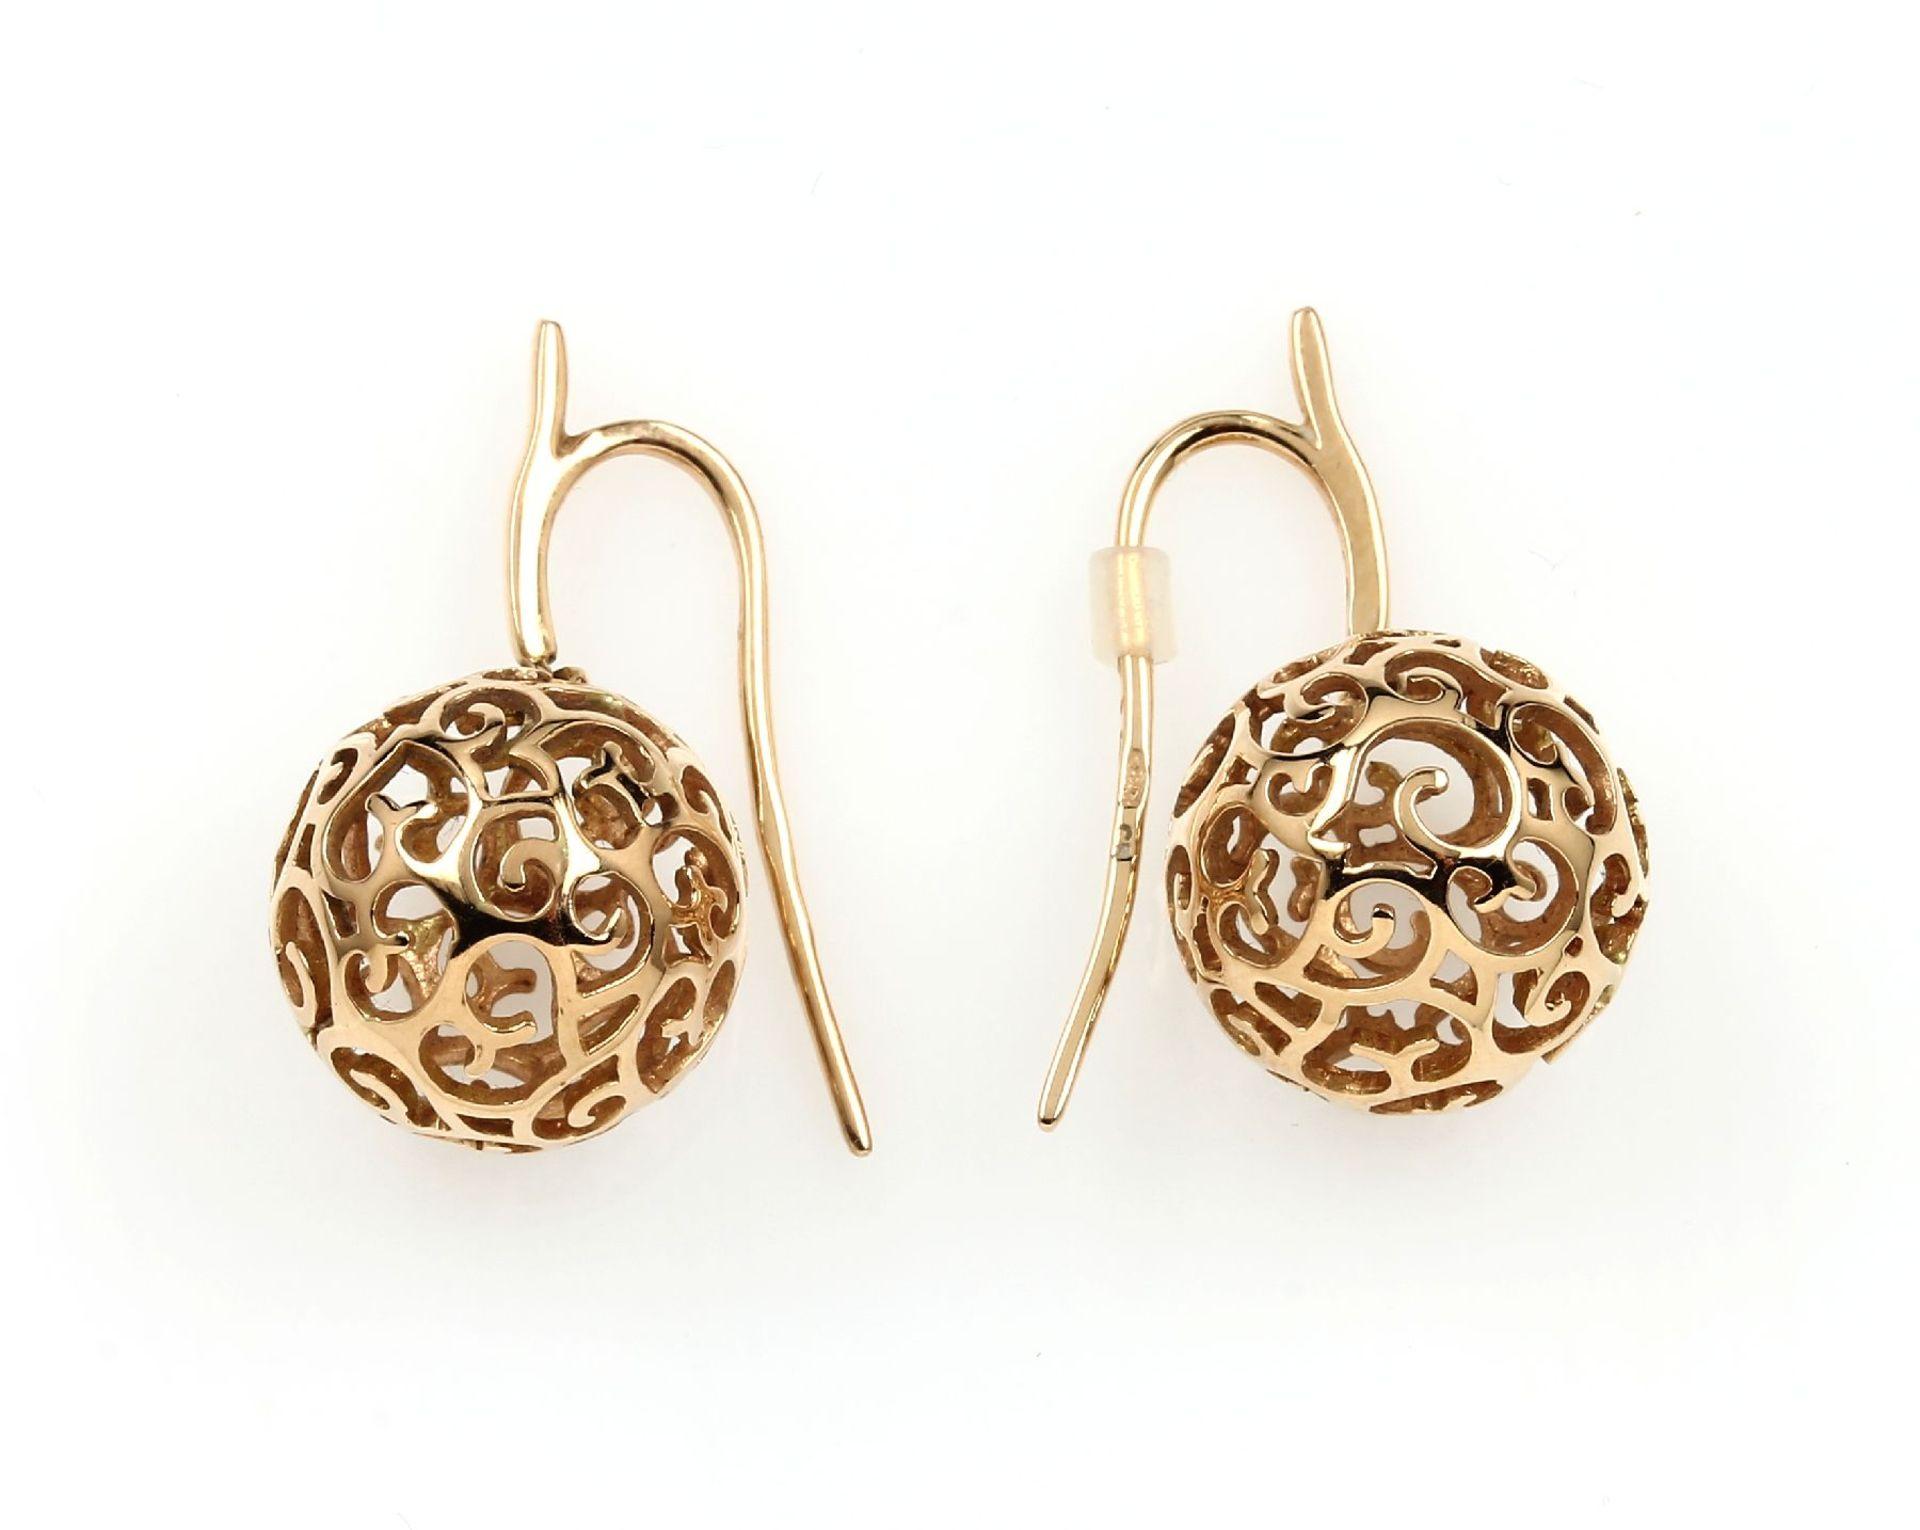 Paar 18 kt Gold BUCHERER Ohrhänger, RoseG 750/000, ausgefallenes Design, Kugelabhängungen mit